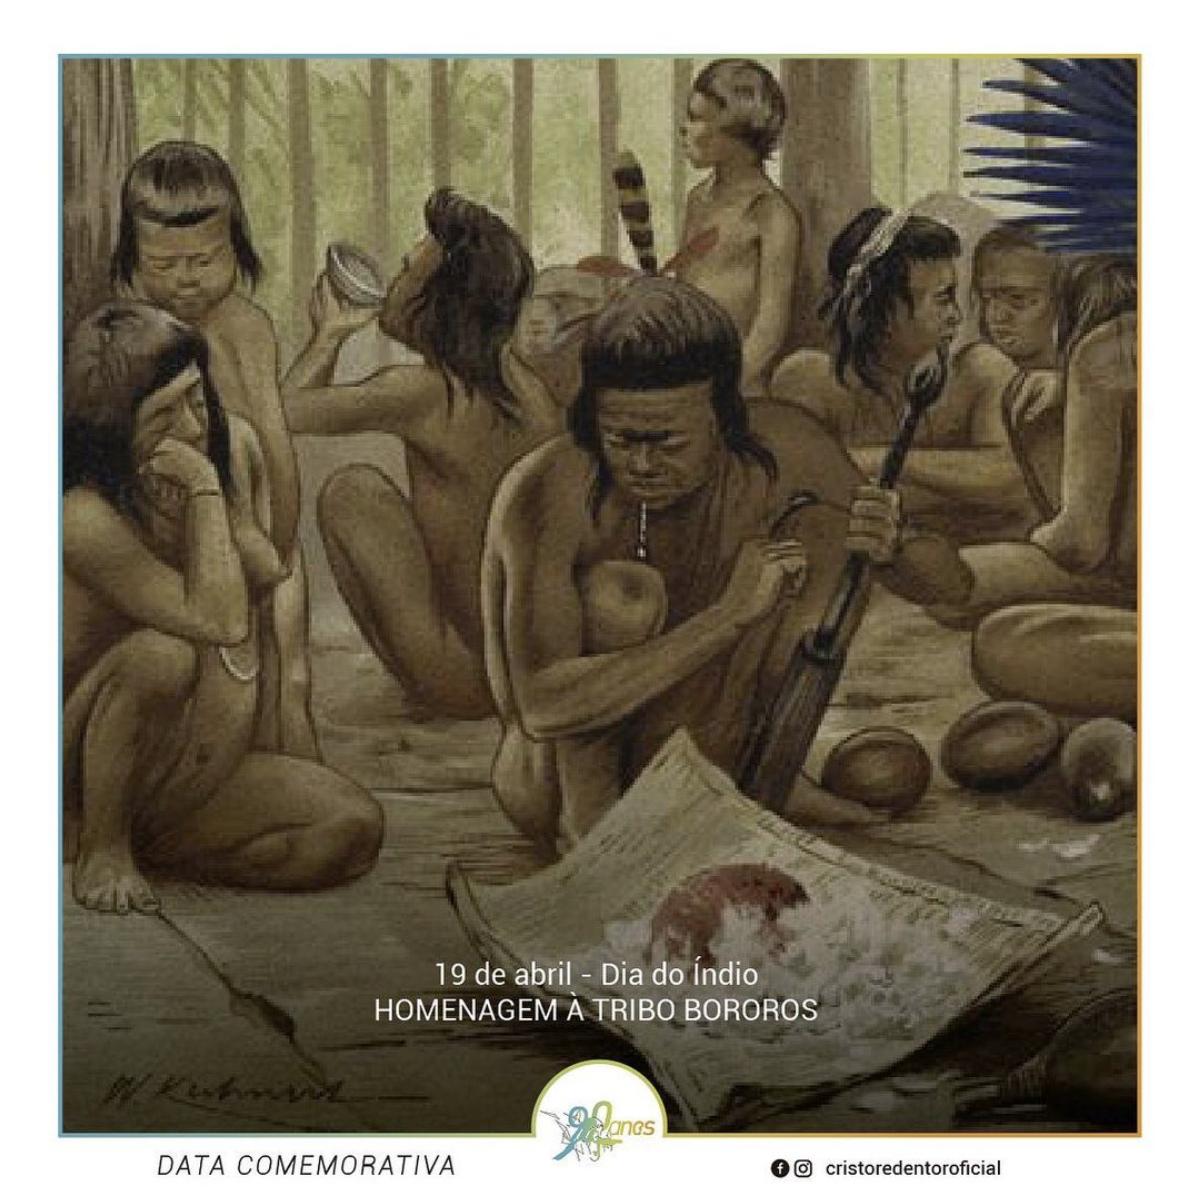 Homenagem Tribo Bororos